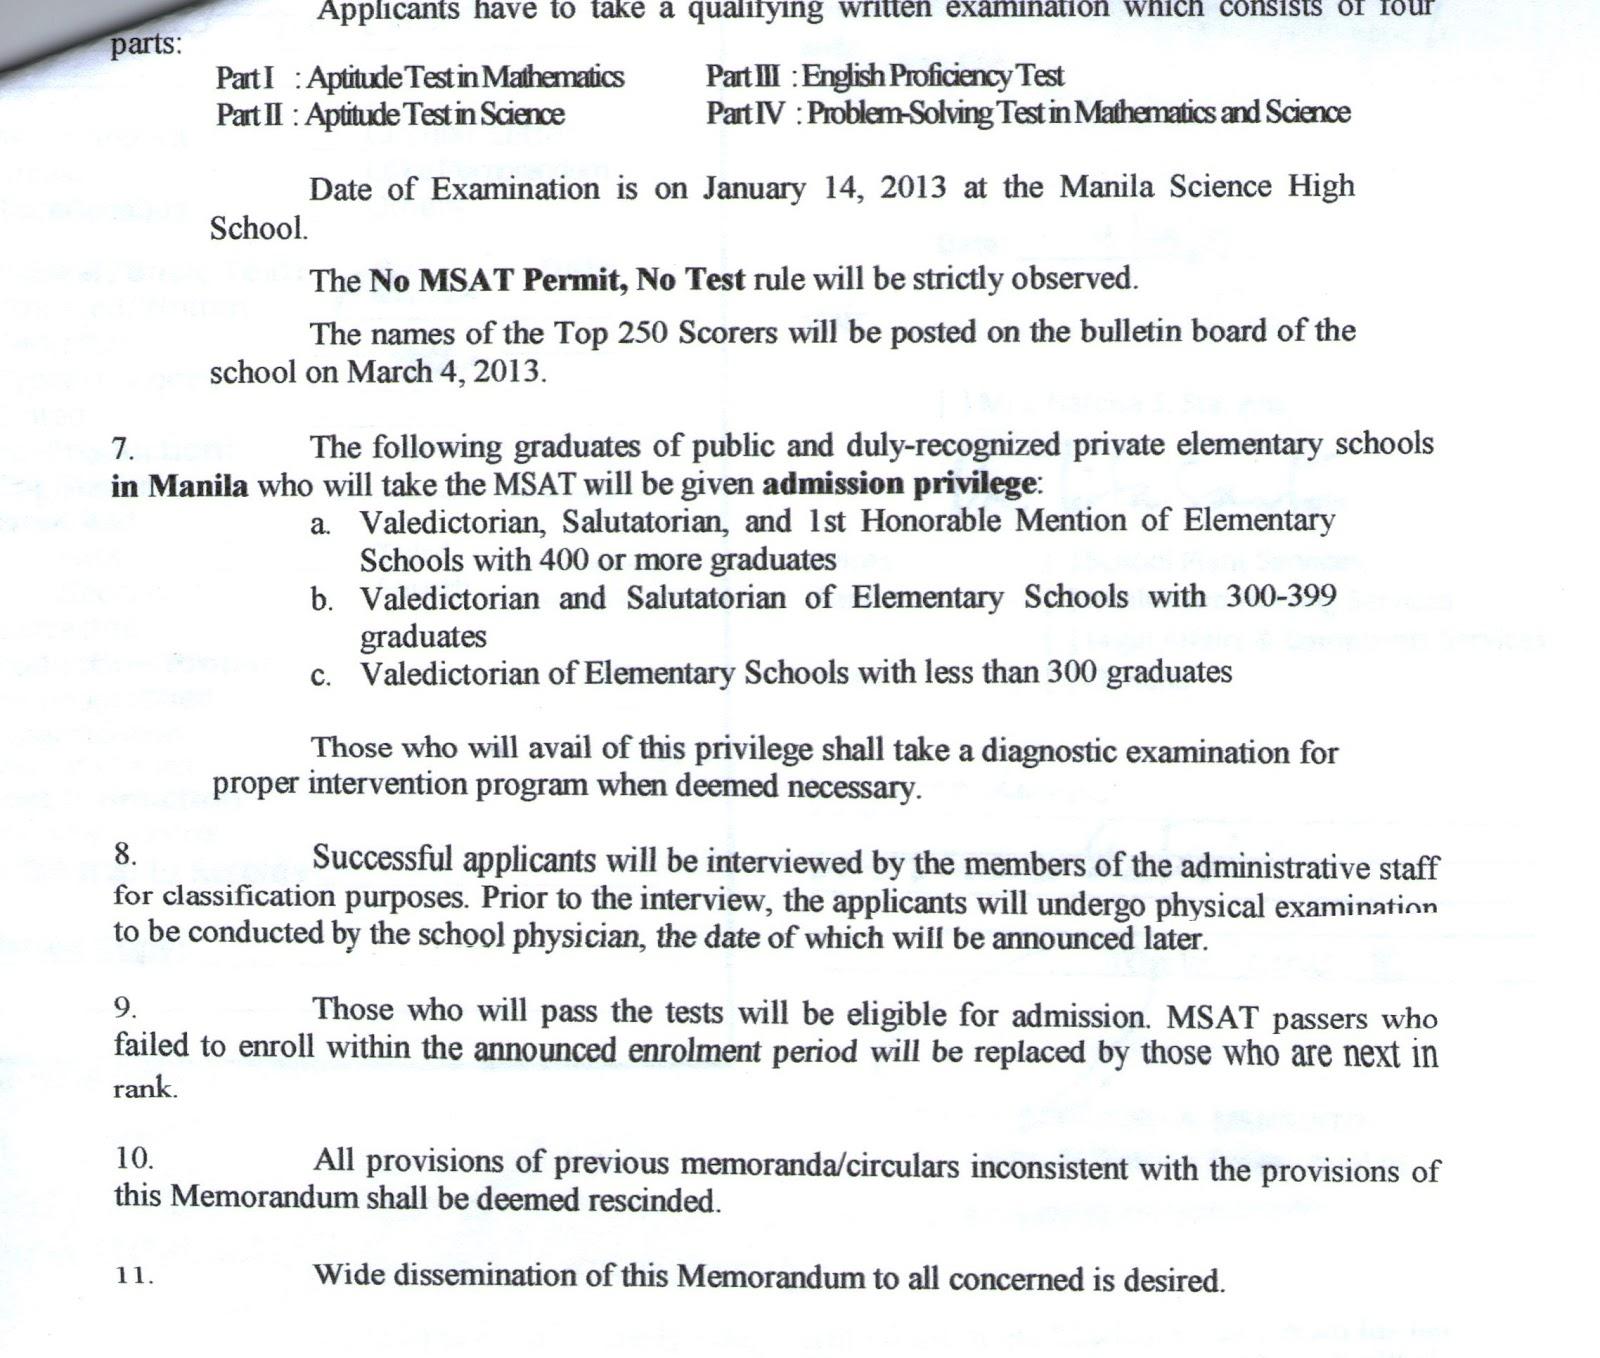 018 Msat002 Essay Example Scholarship Amazing Topics Prompts 2017 2016 Question Paper 2018 Class 5 Full